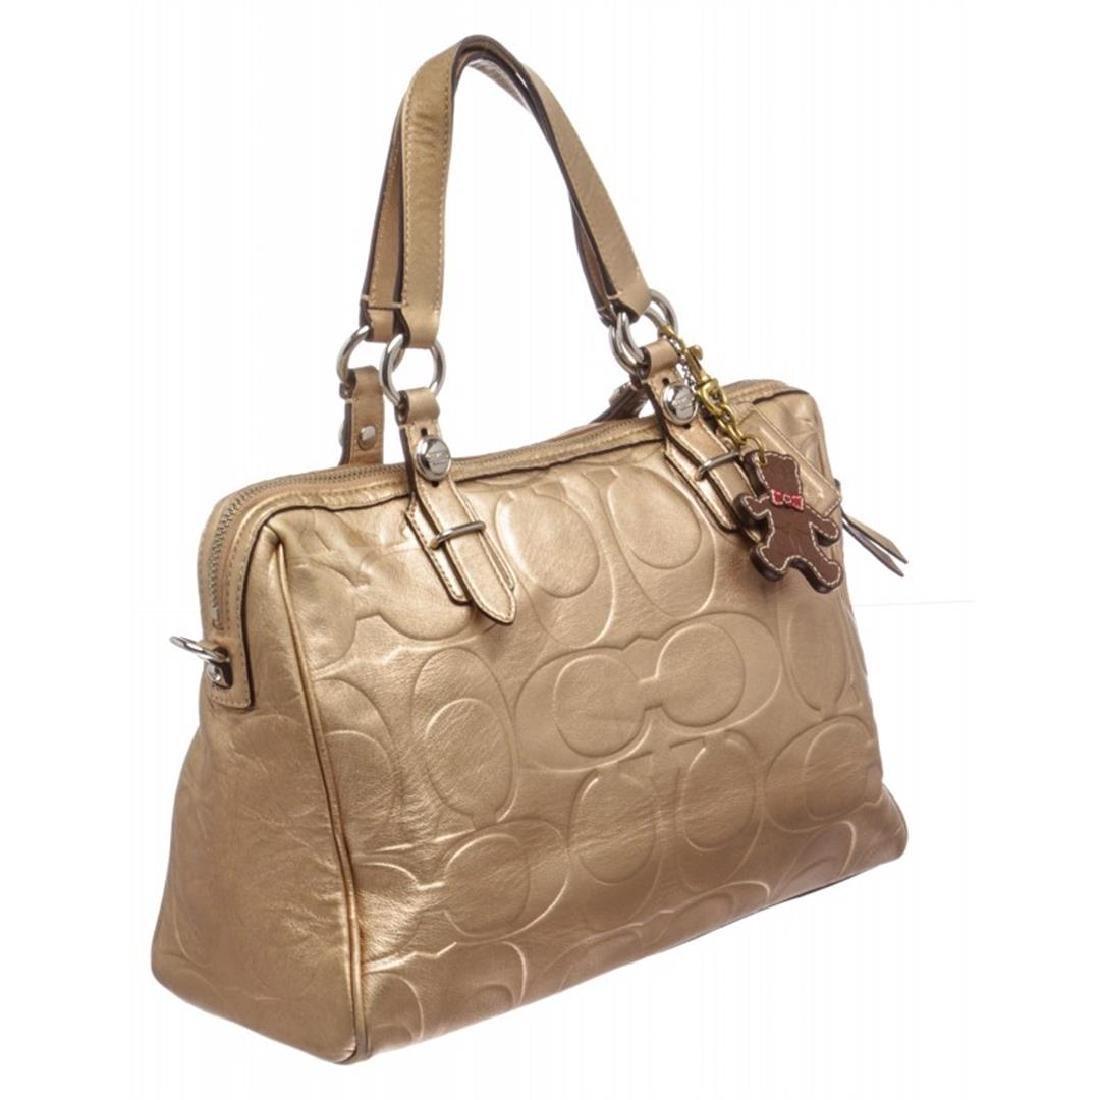 Coach Metallic Gold Monogram Leather Tote Bag - 2